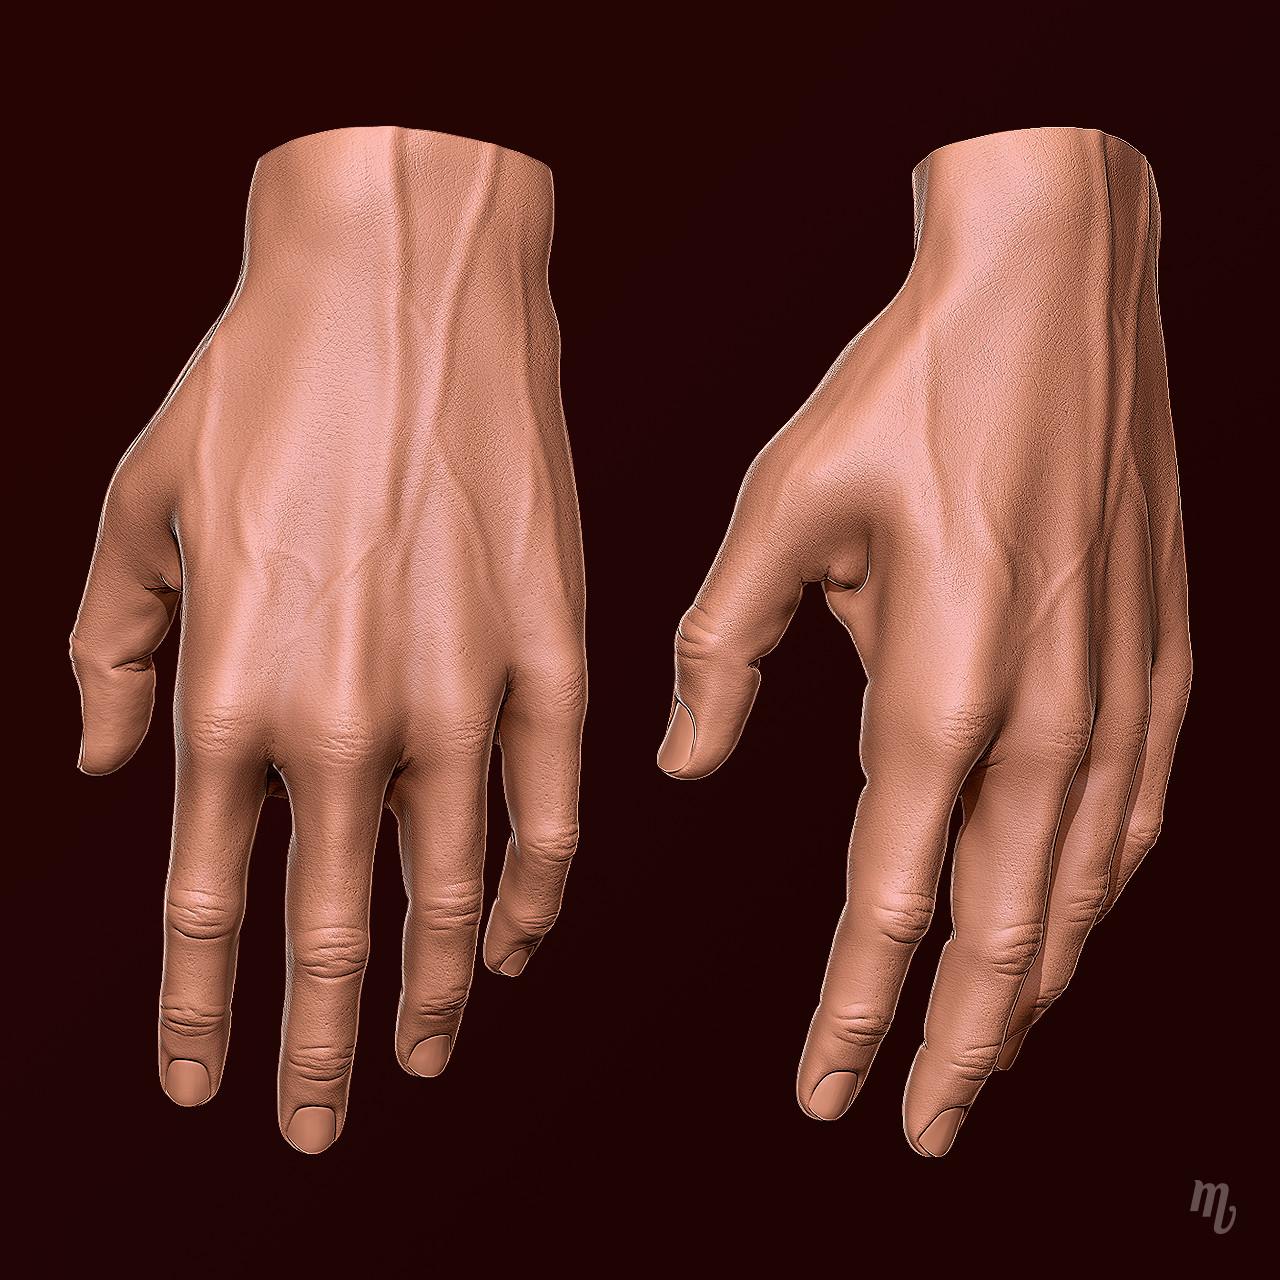 Marc virgili hand 03